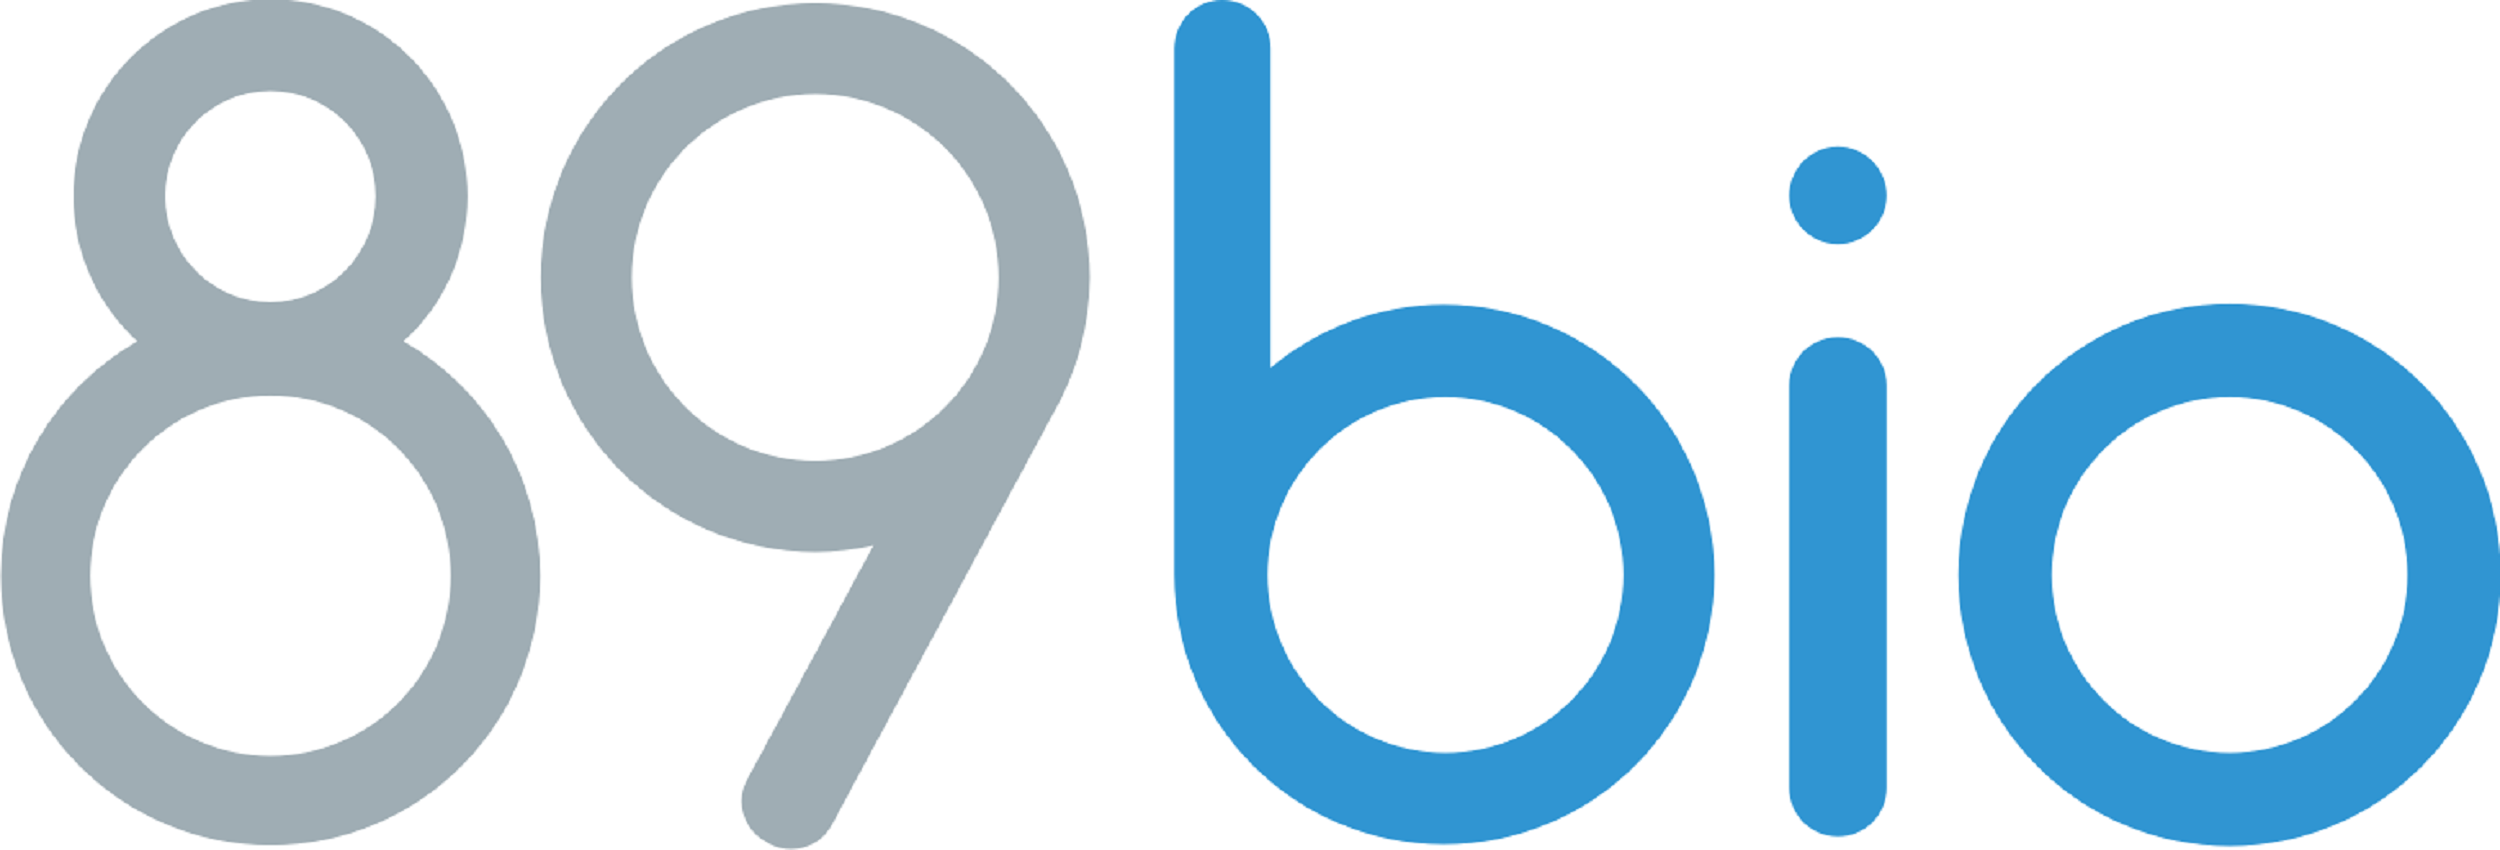 ETNB logo